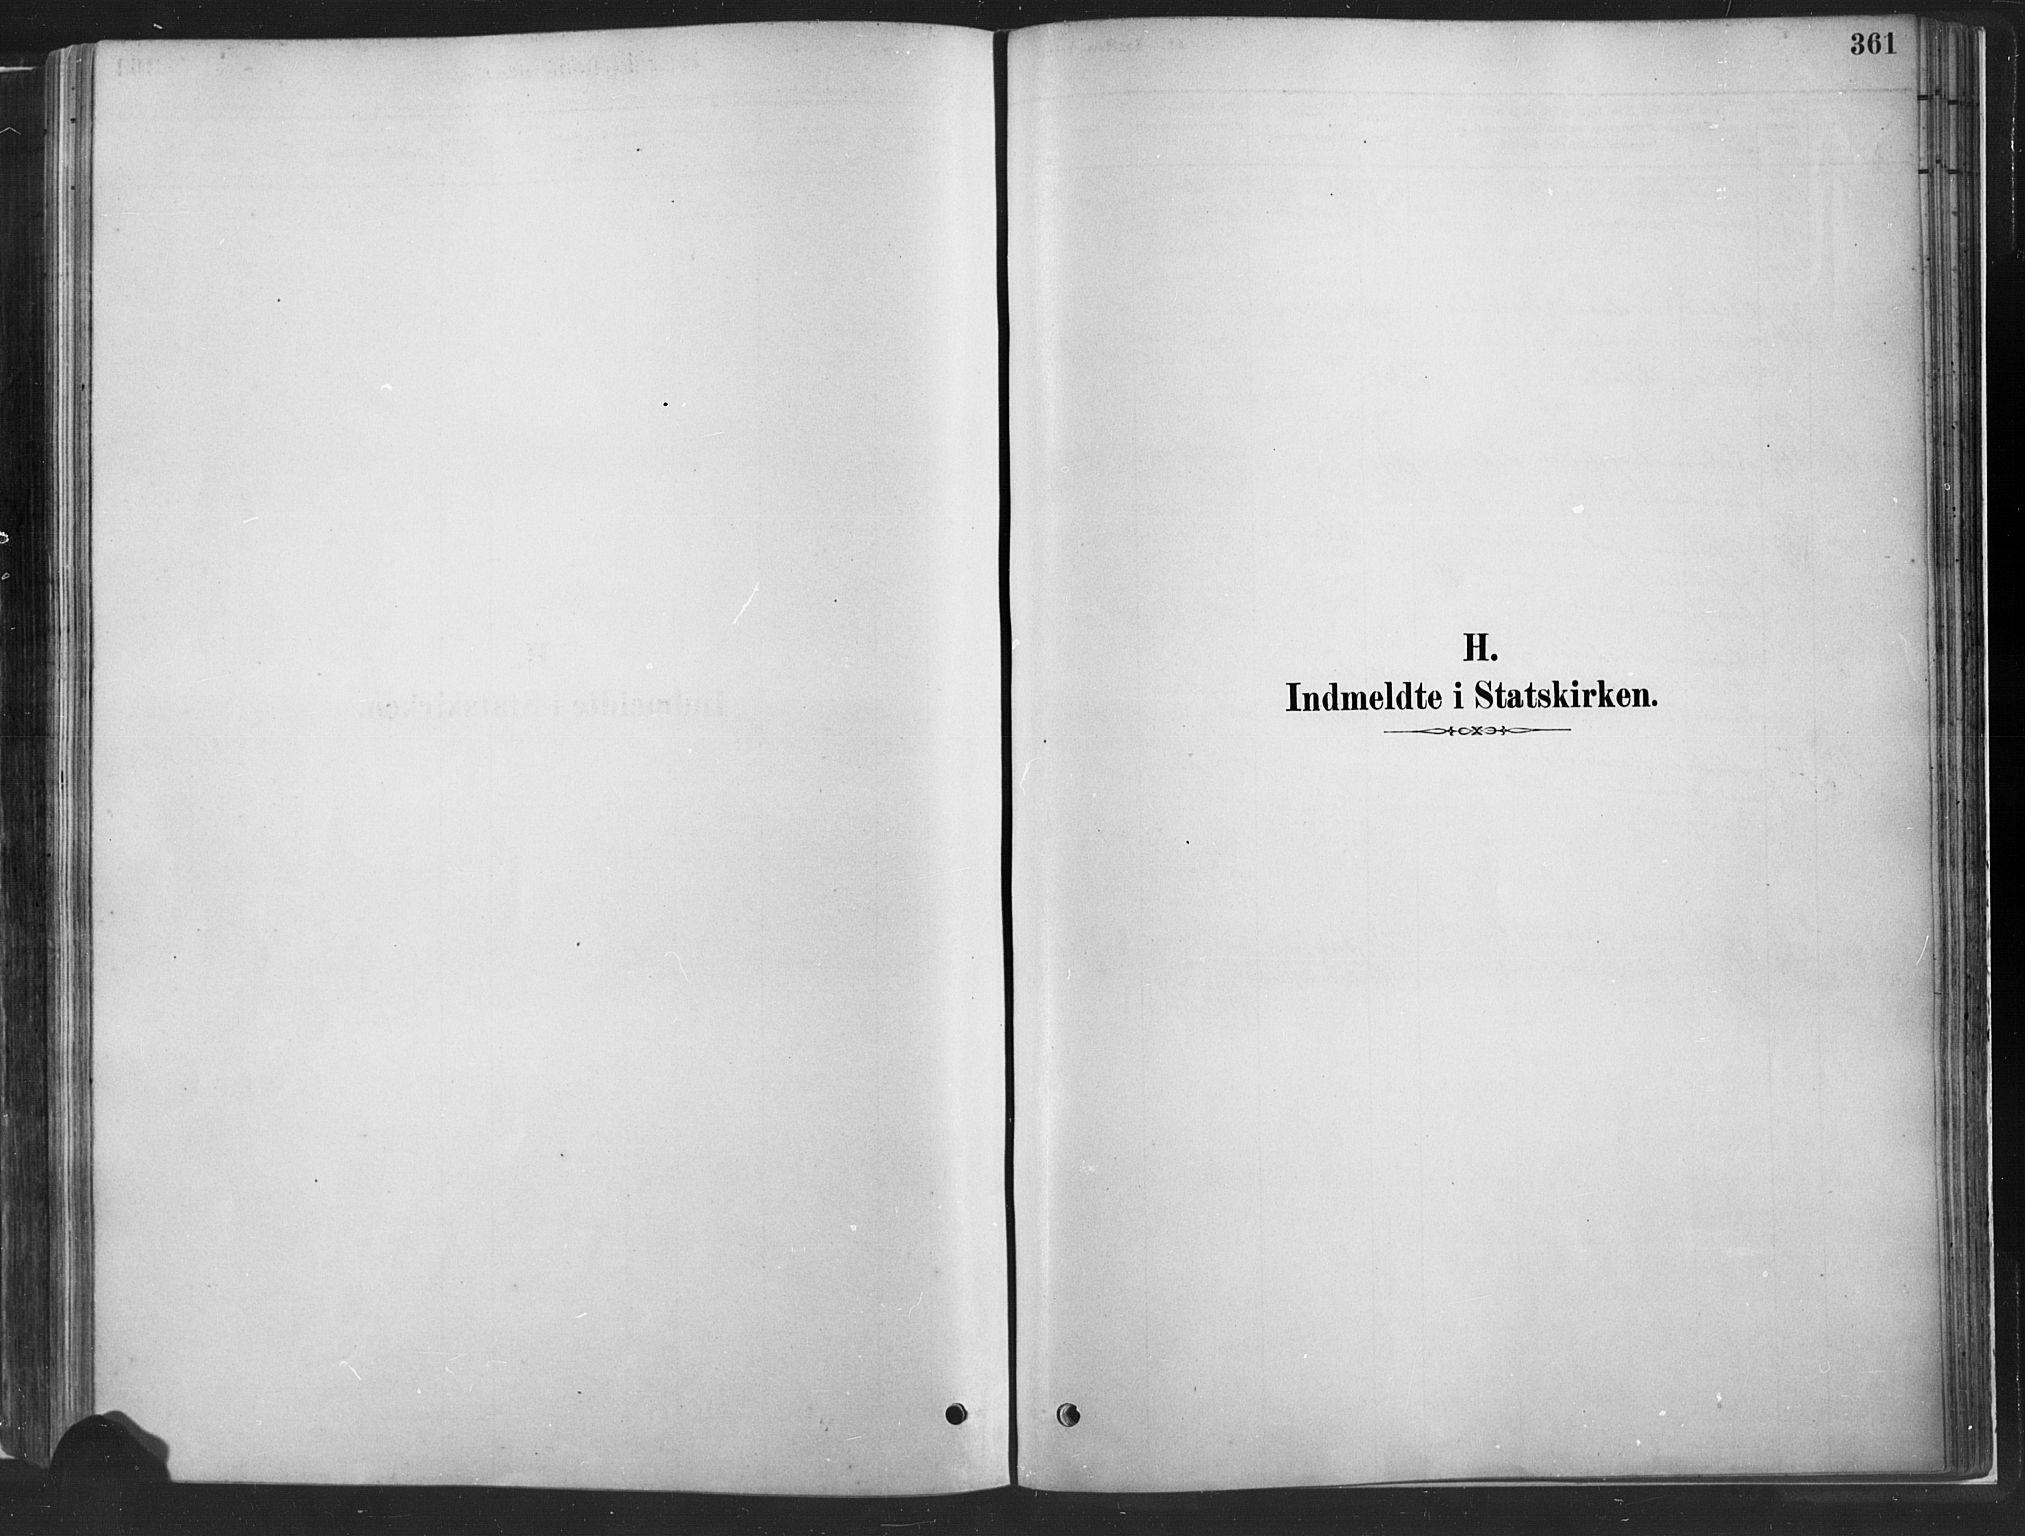 SAH, Fåberg prestekontor, Ministerialbok nr. 10, 1879-1900, s. 361